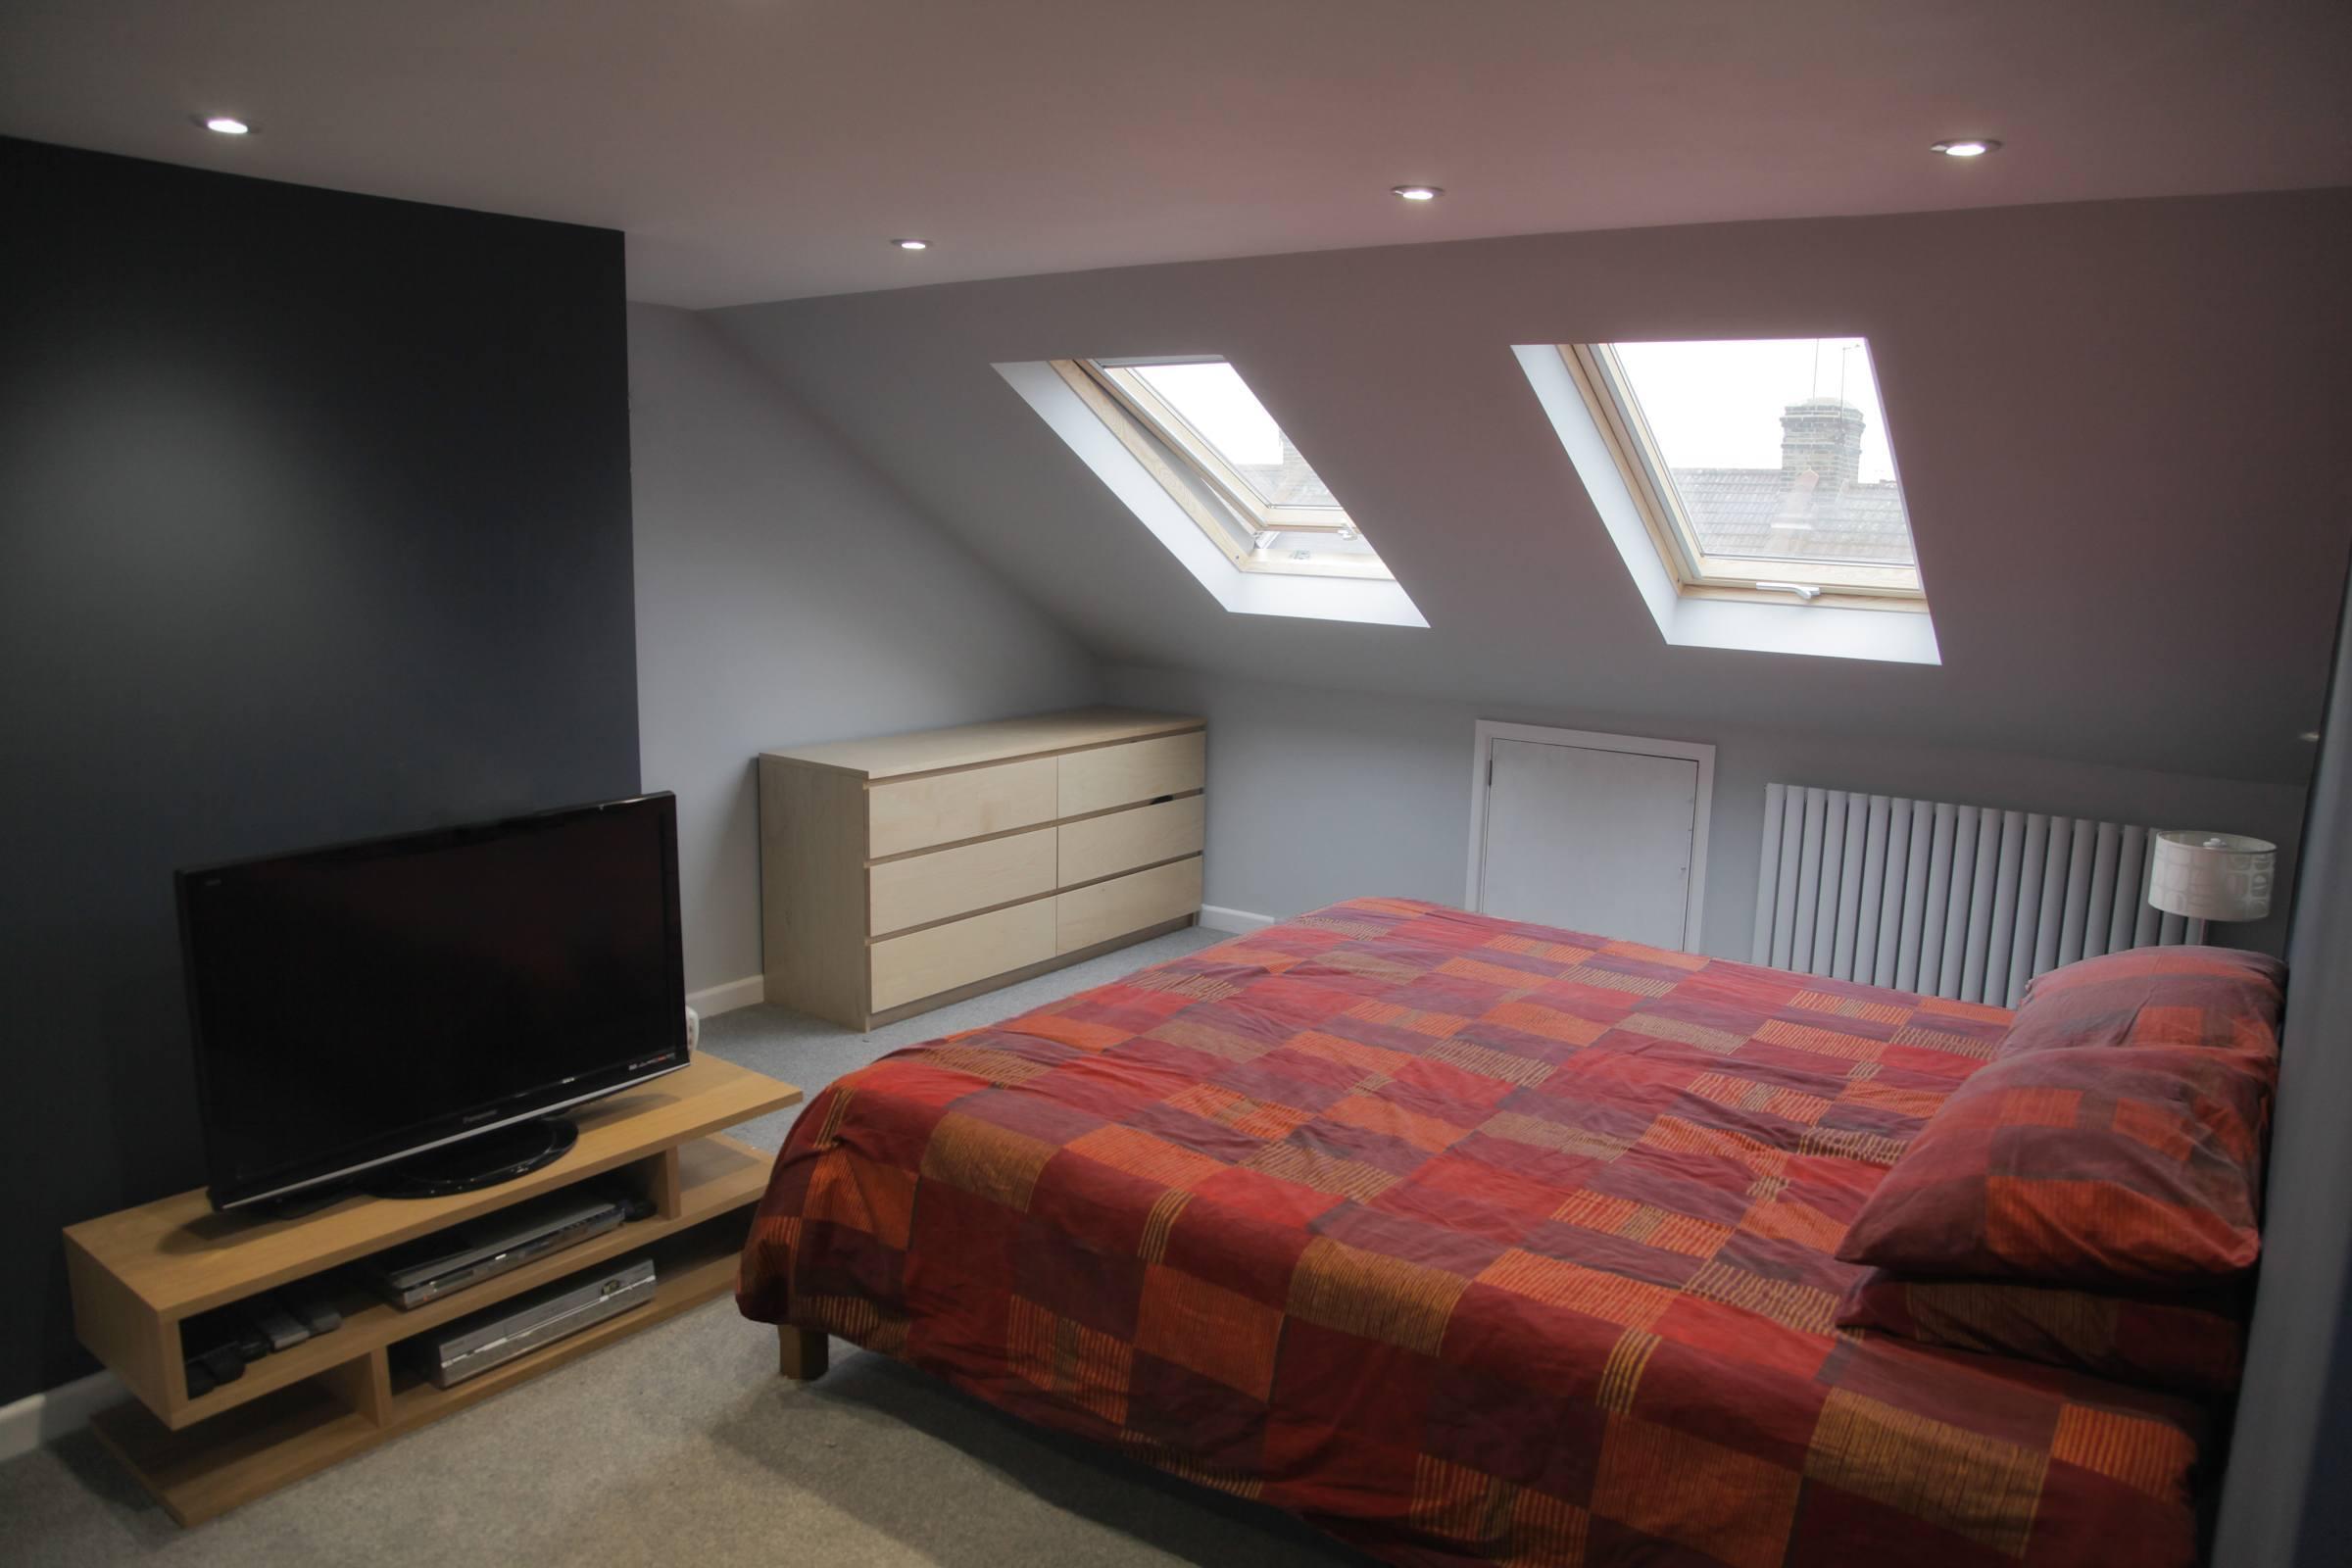 Mesmerizing Small Loft Bedroom Designs Ideas - The ...